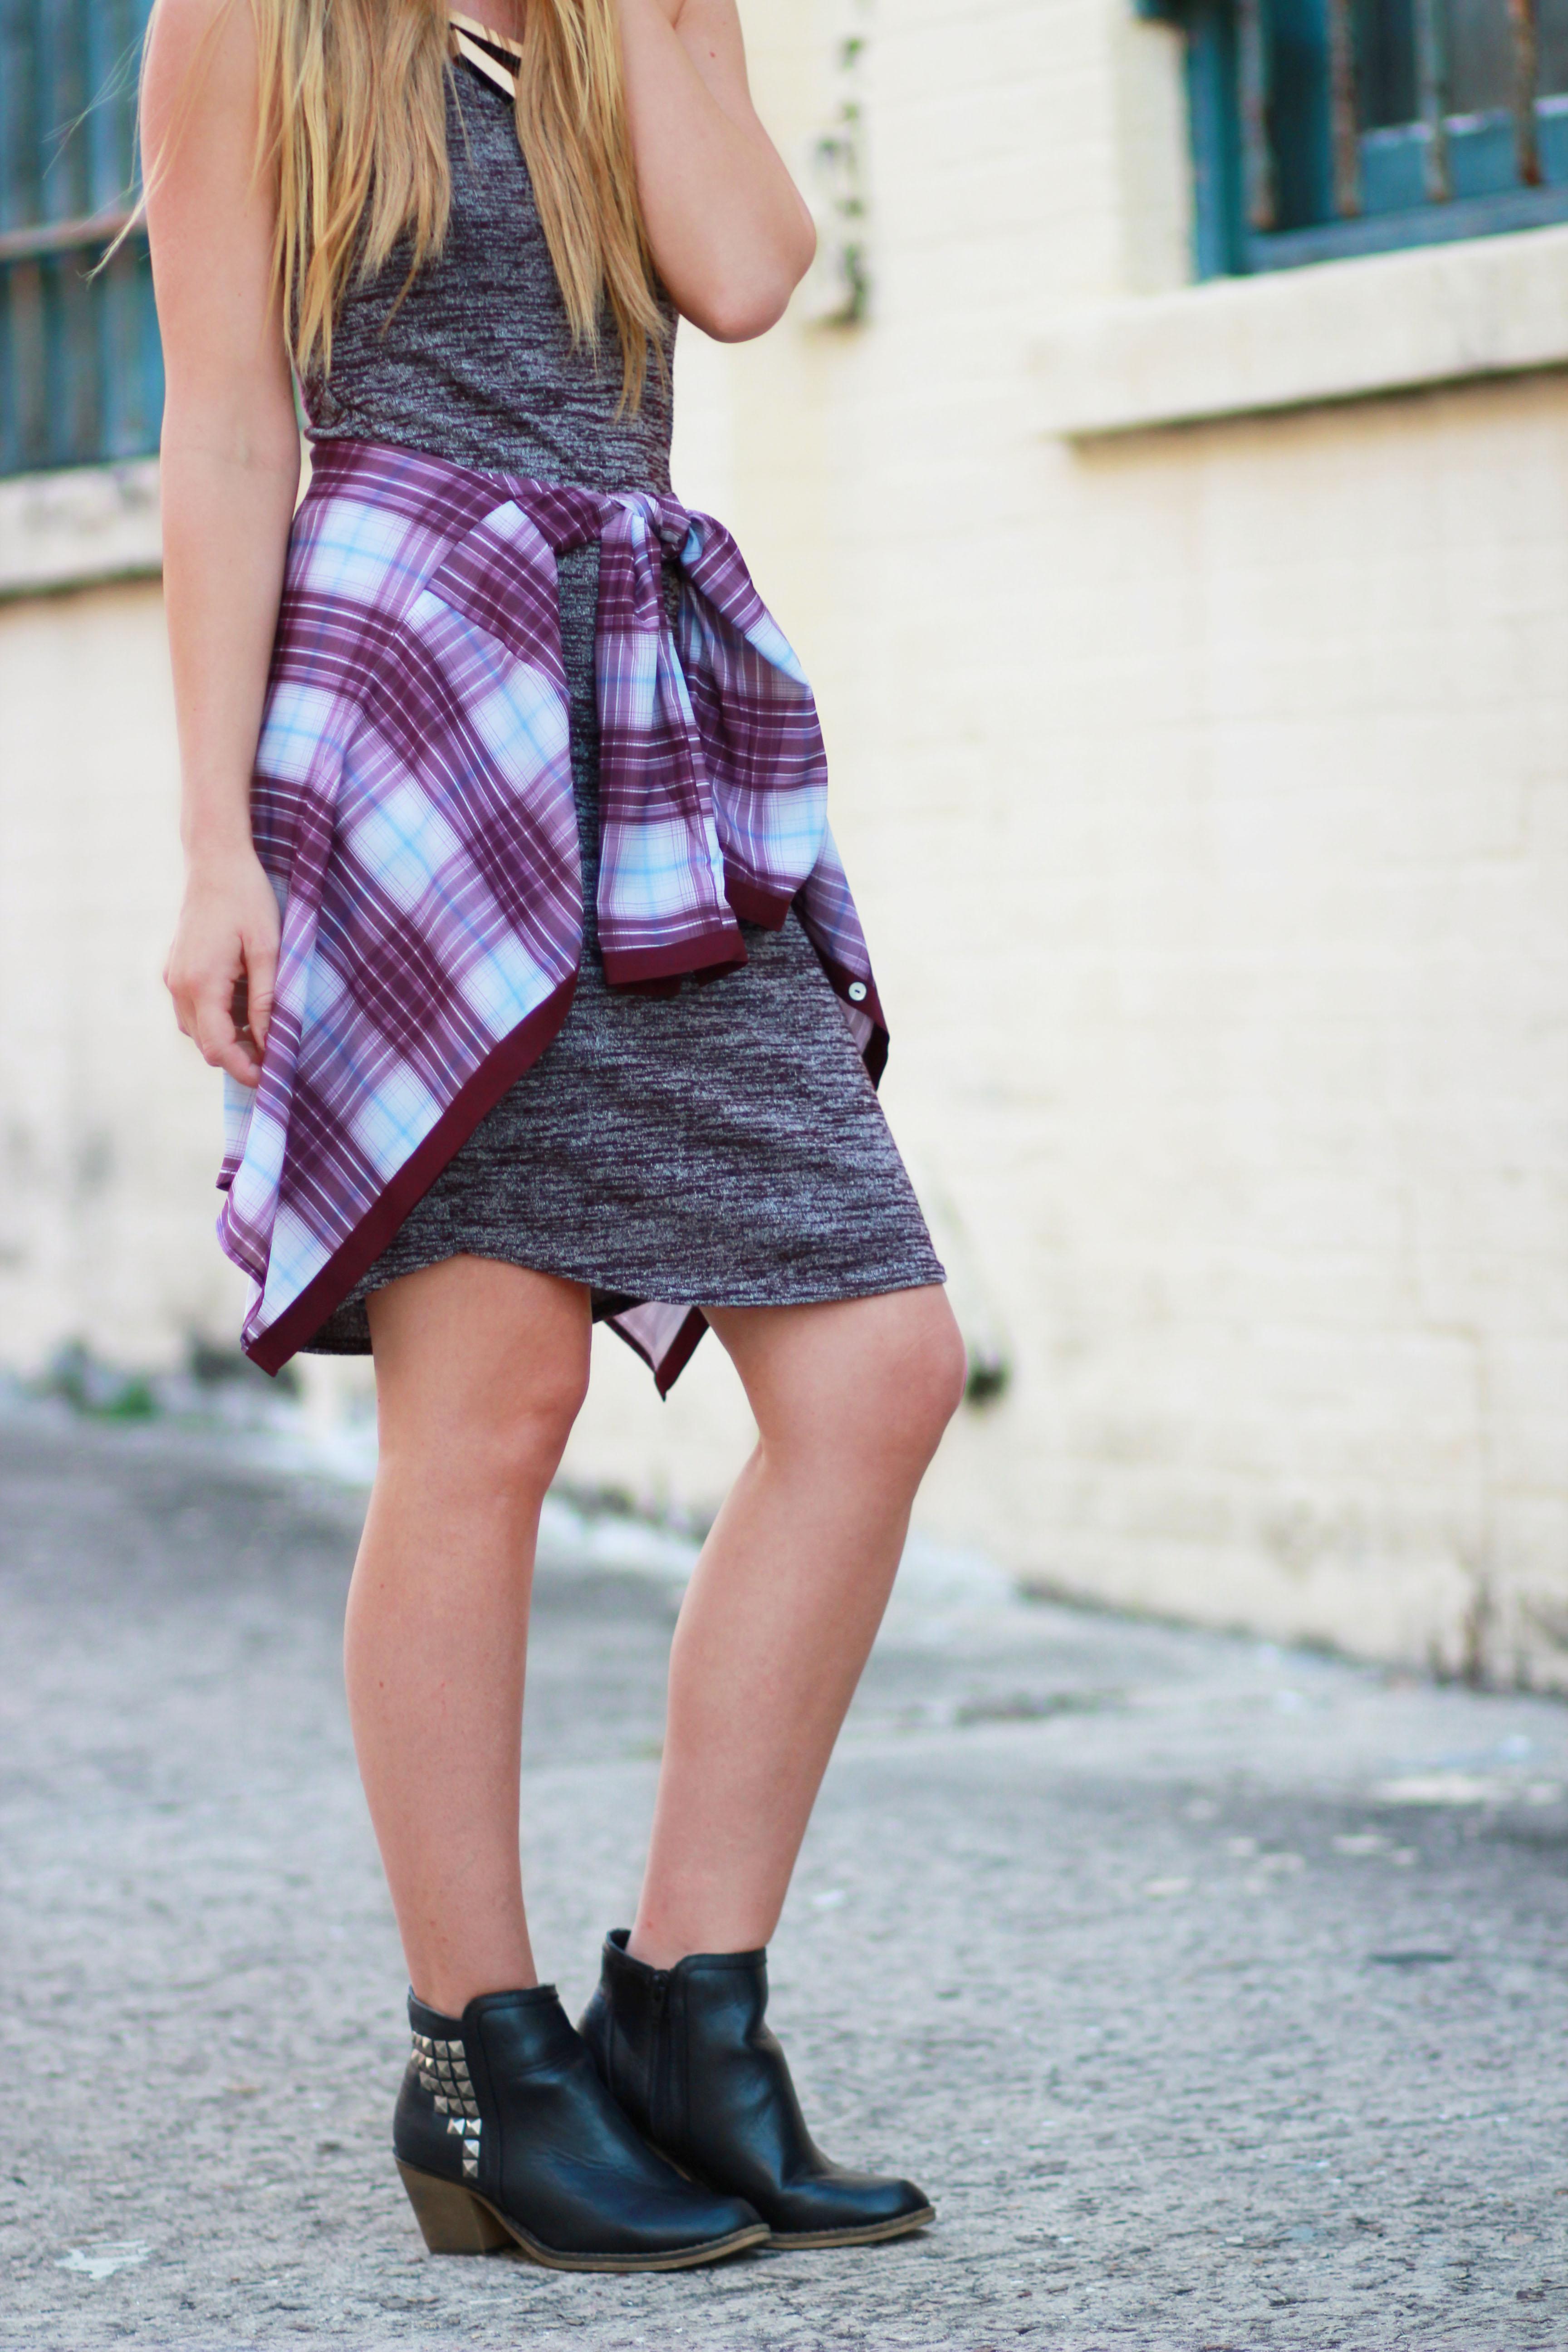 Purple Grunge | Upbeat Soles | Orlando Florida Fashion Blog